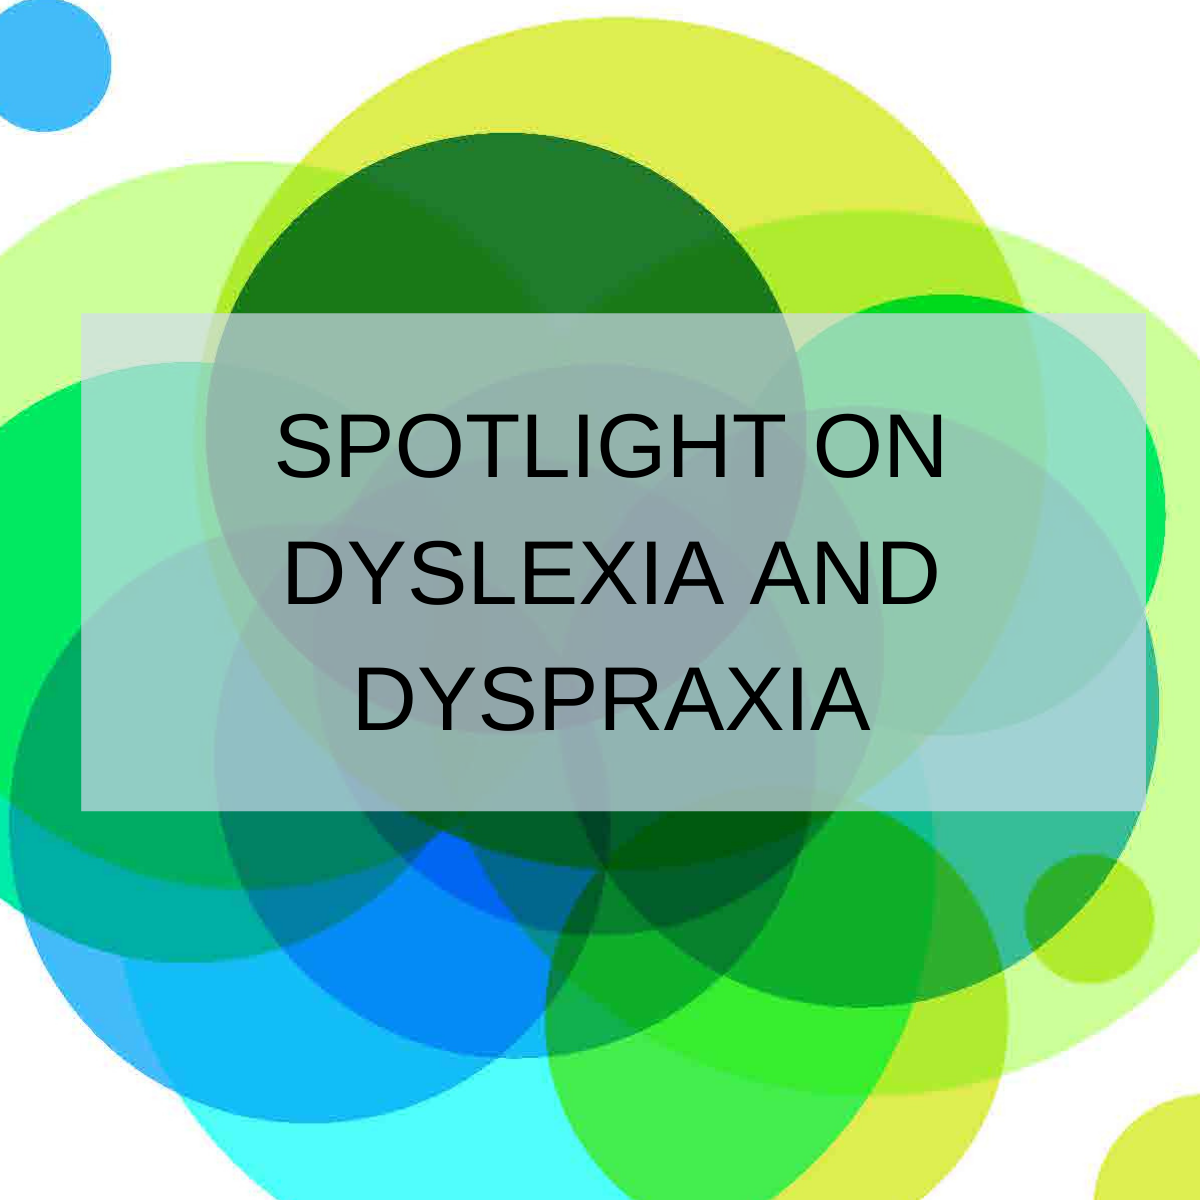 Spotlight on Dyslexia and Dyspraxia: A Routledge and nasen FreeBook